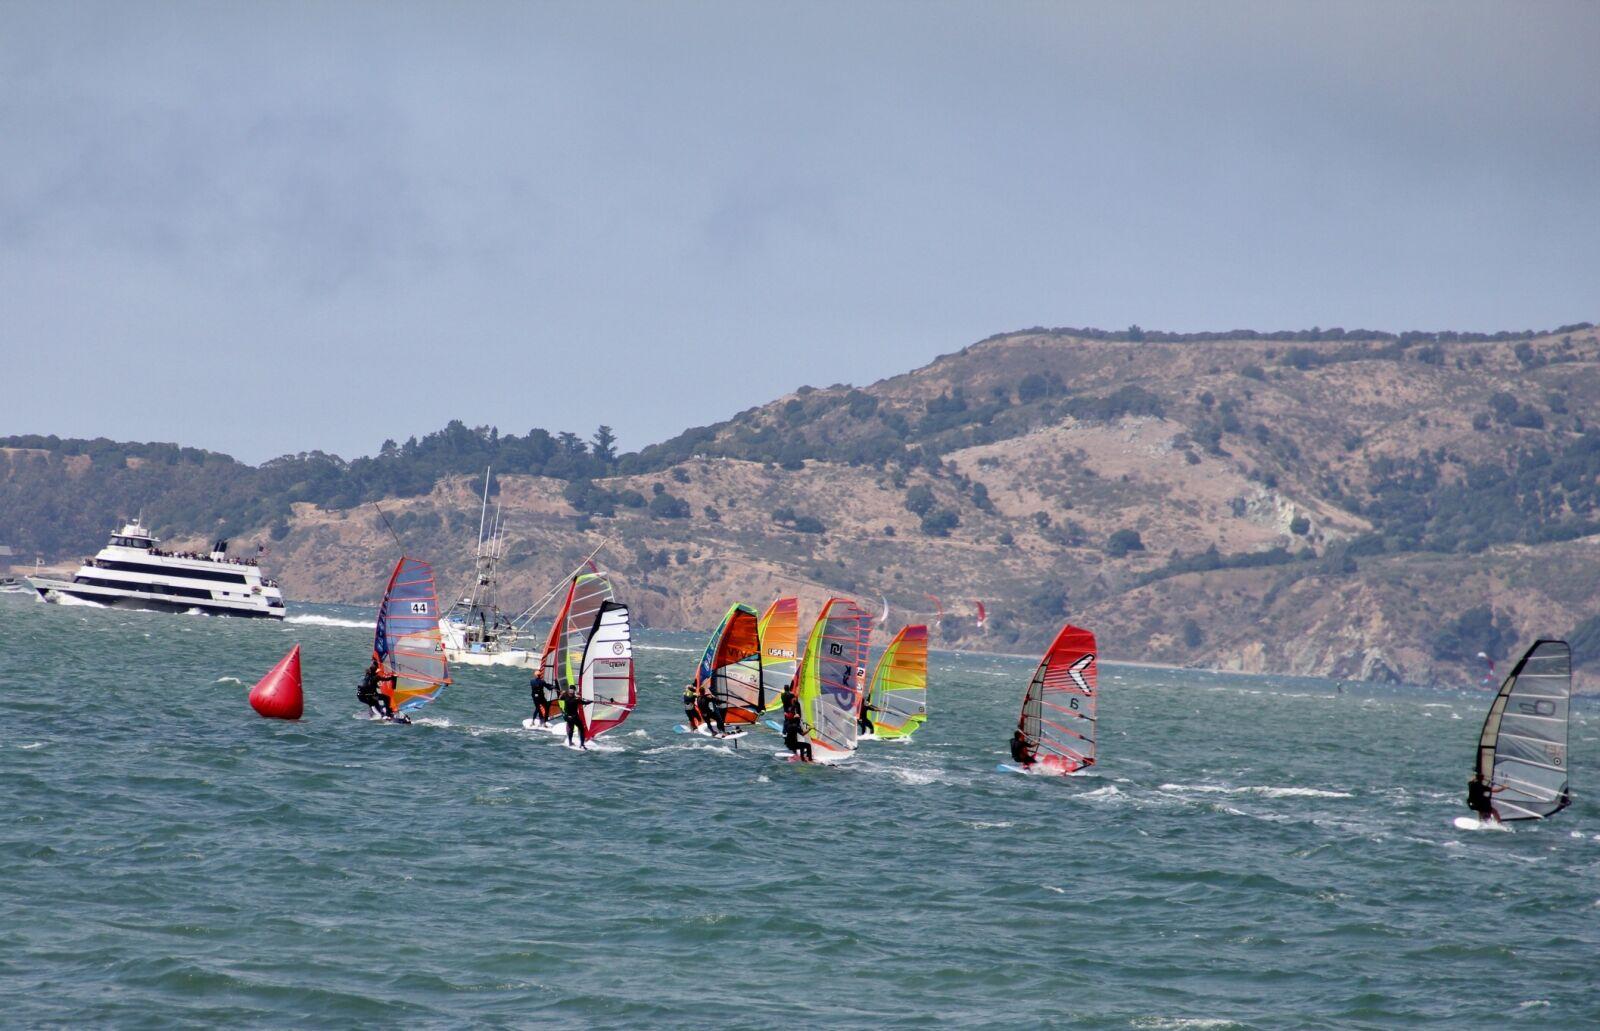 Windsurfing Magazine's Board Test, Cape Hatteras – US WINDSURFING